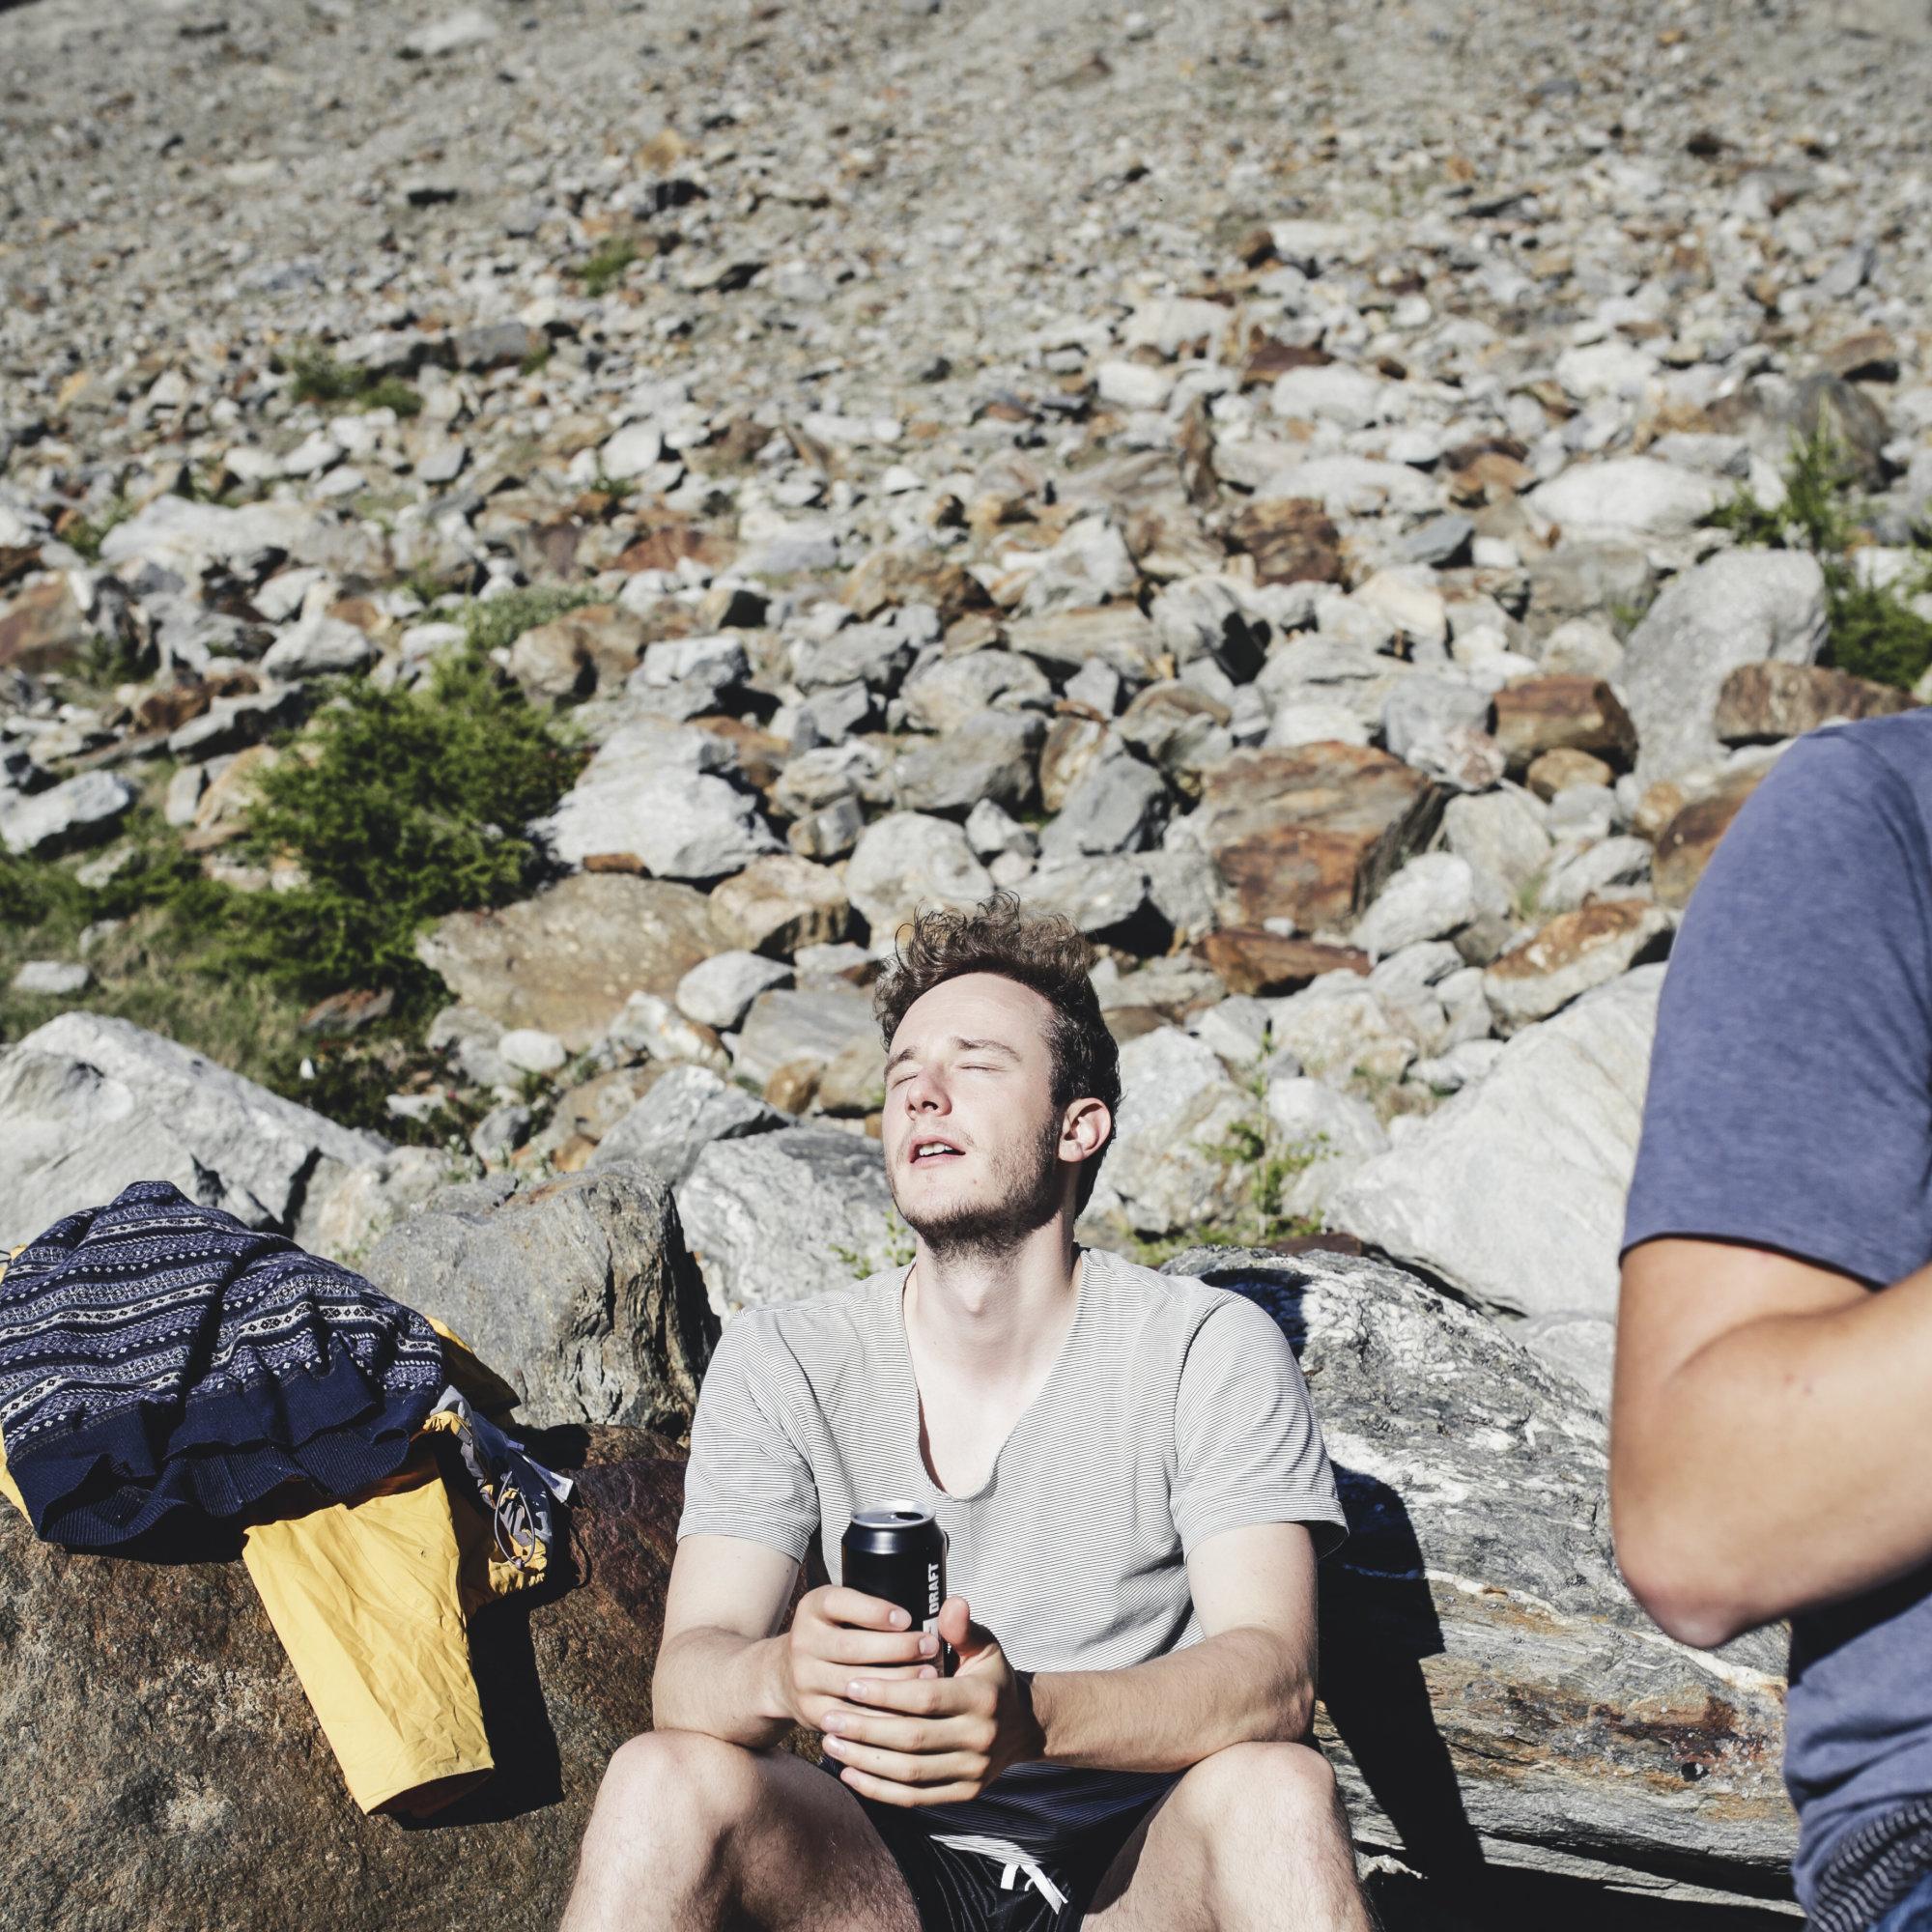 041-kasuma-photografie-photoblog-travelblog-outdoor-camping-2017-gletschertor-alpia-graechen